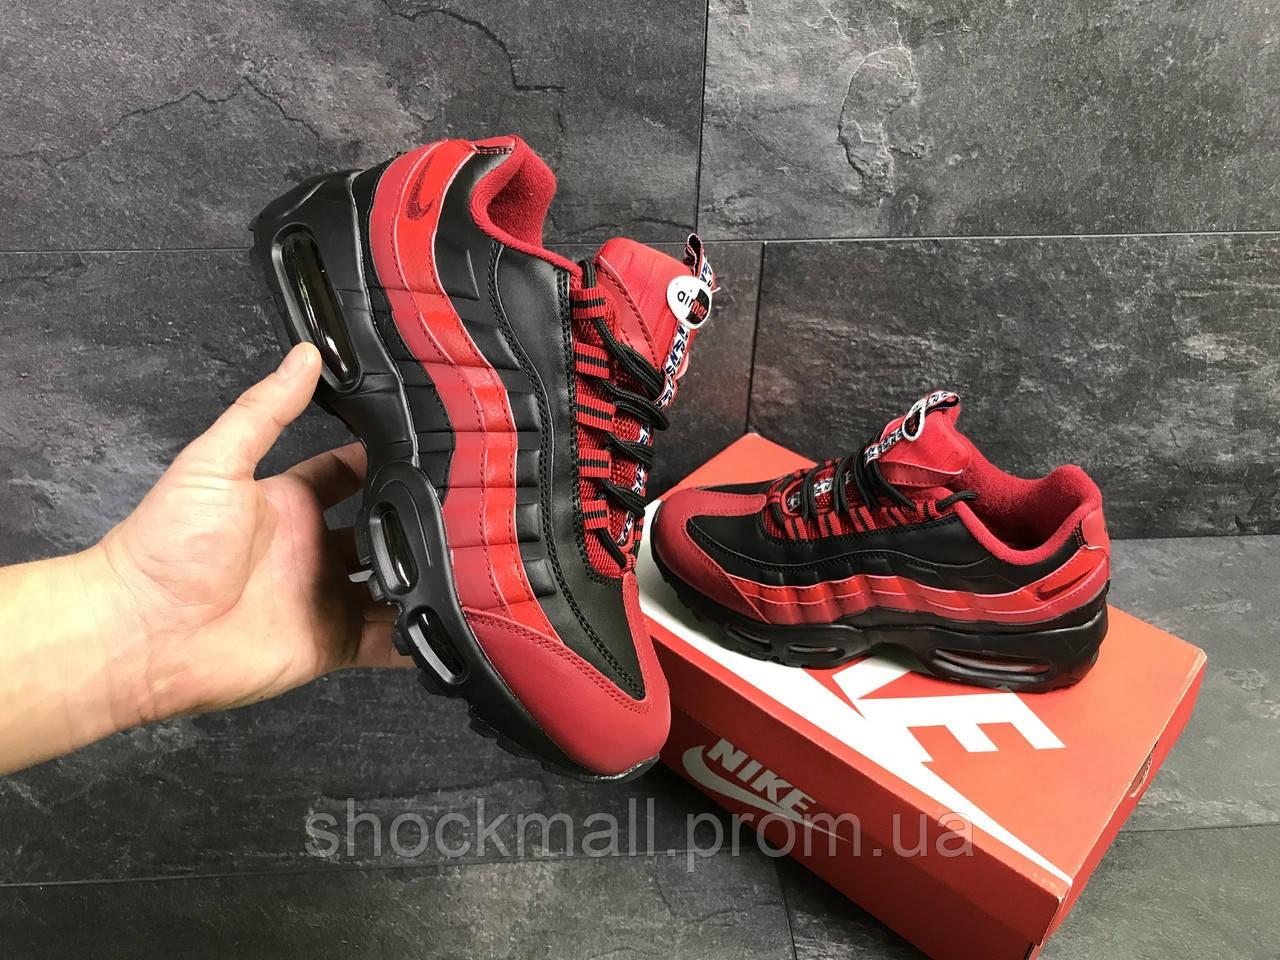 e33a4446 ... Кроссовки мужские Nike Air Max 95 черные кожа Индонезия реплика, ...